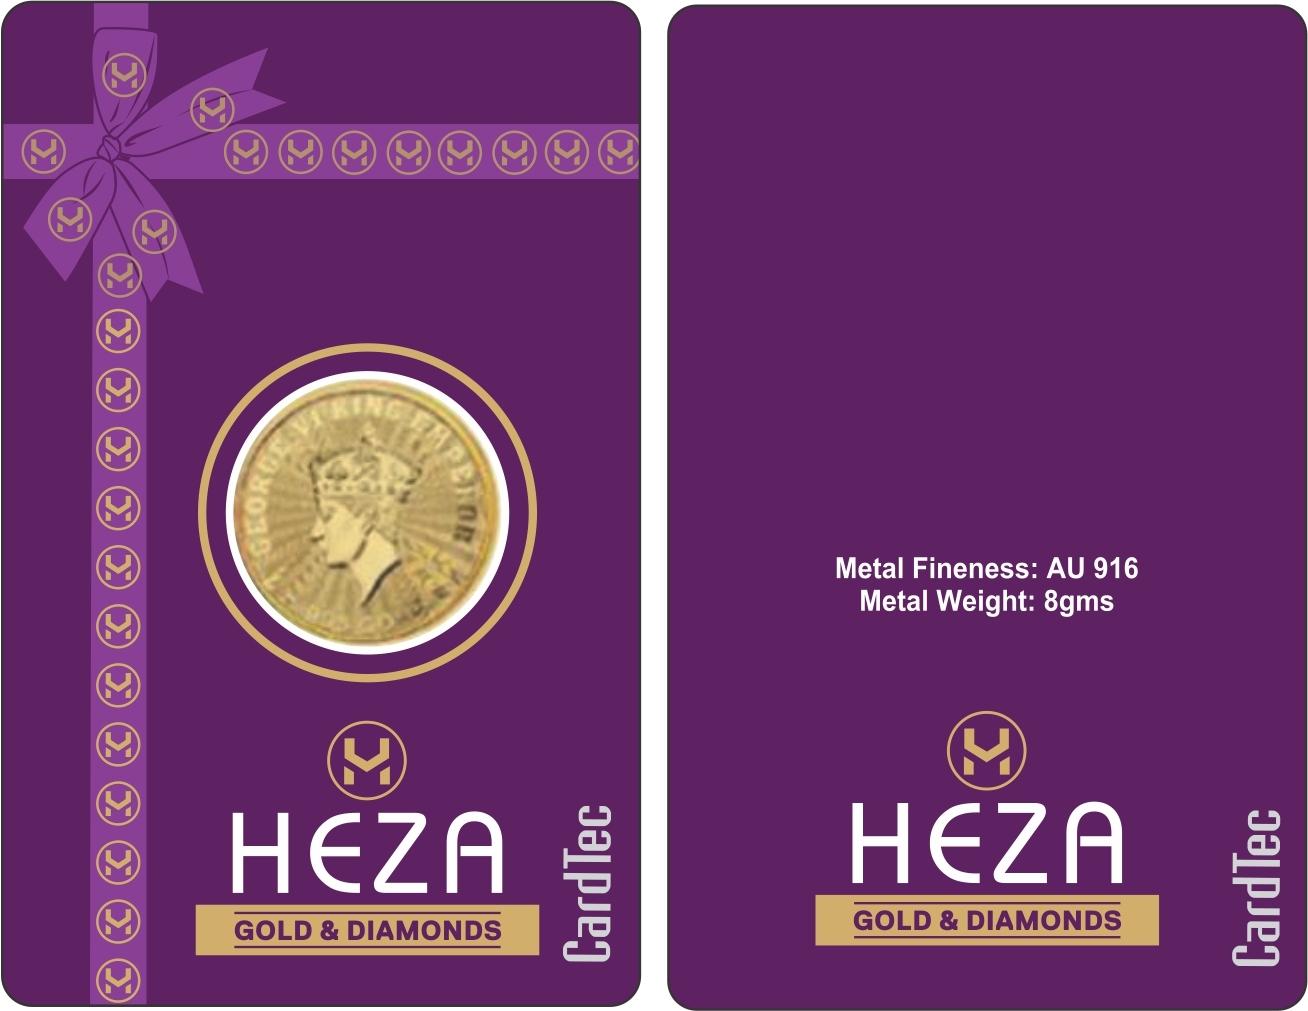 Coin Card samples